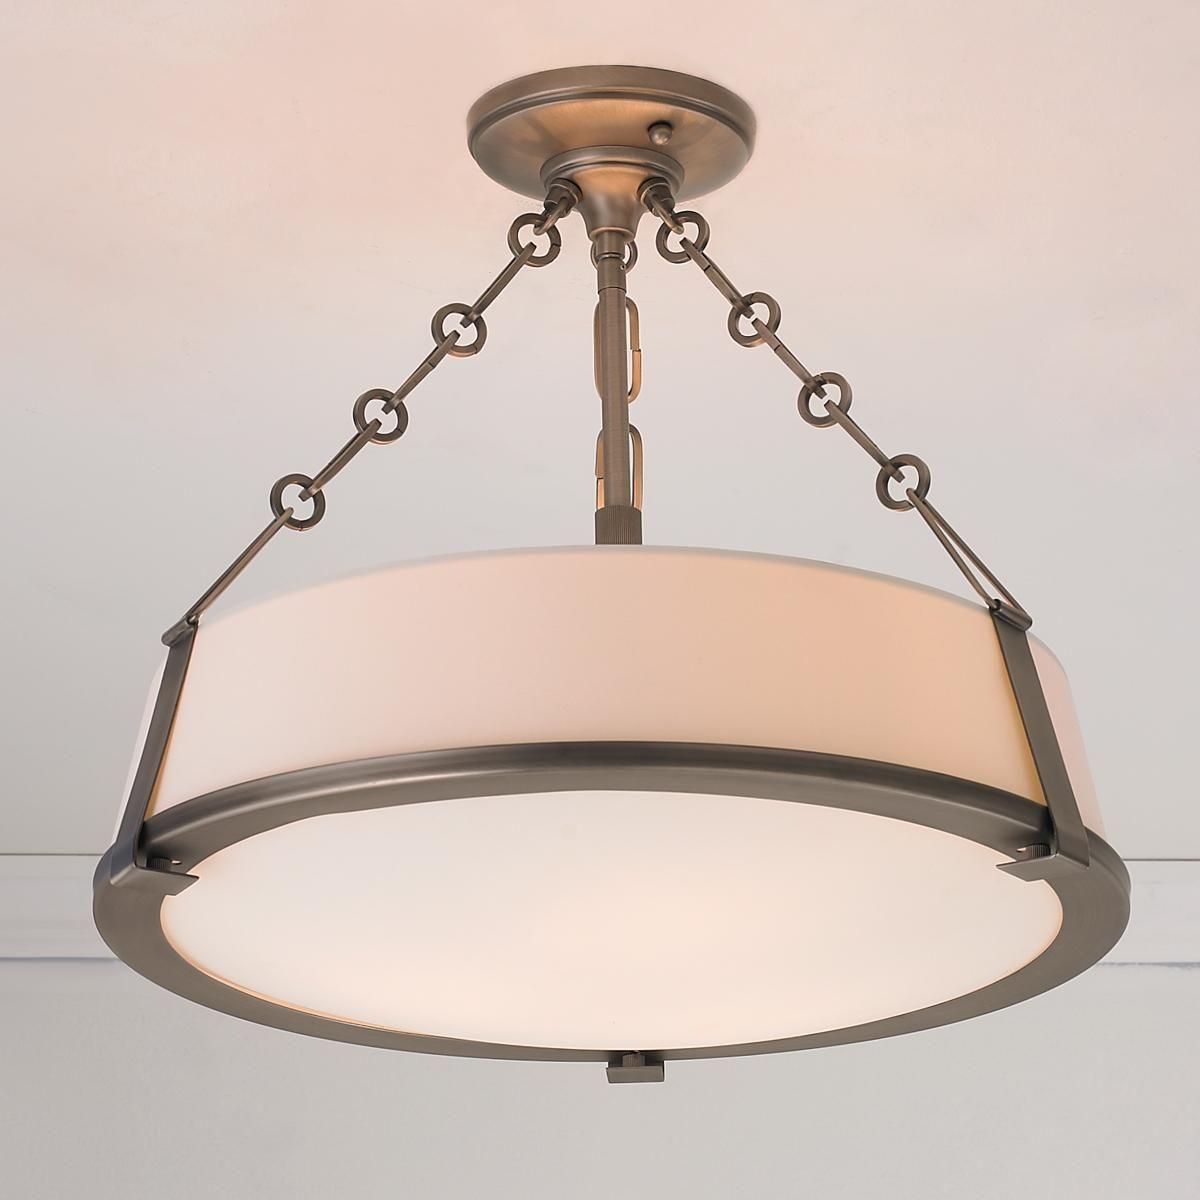 Deco Modern Semi Flush Ceiling Light Shades Of Light Semi Flush Ceiling Lights Ceiling Lights Ceiling Light Shades